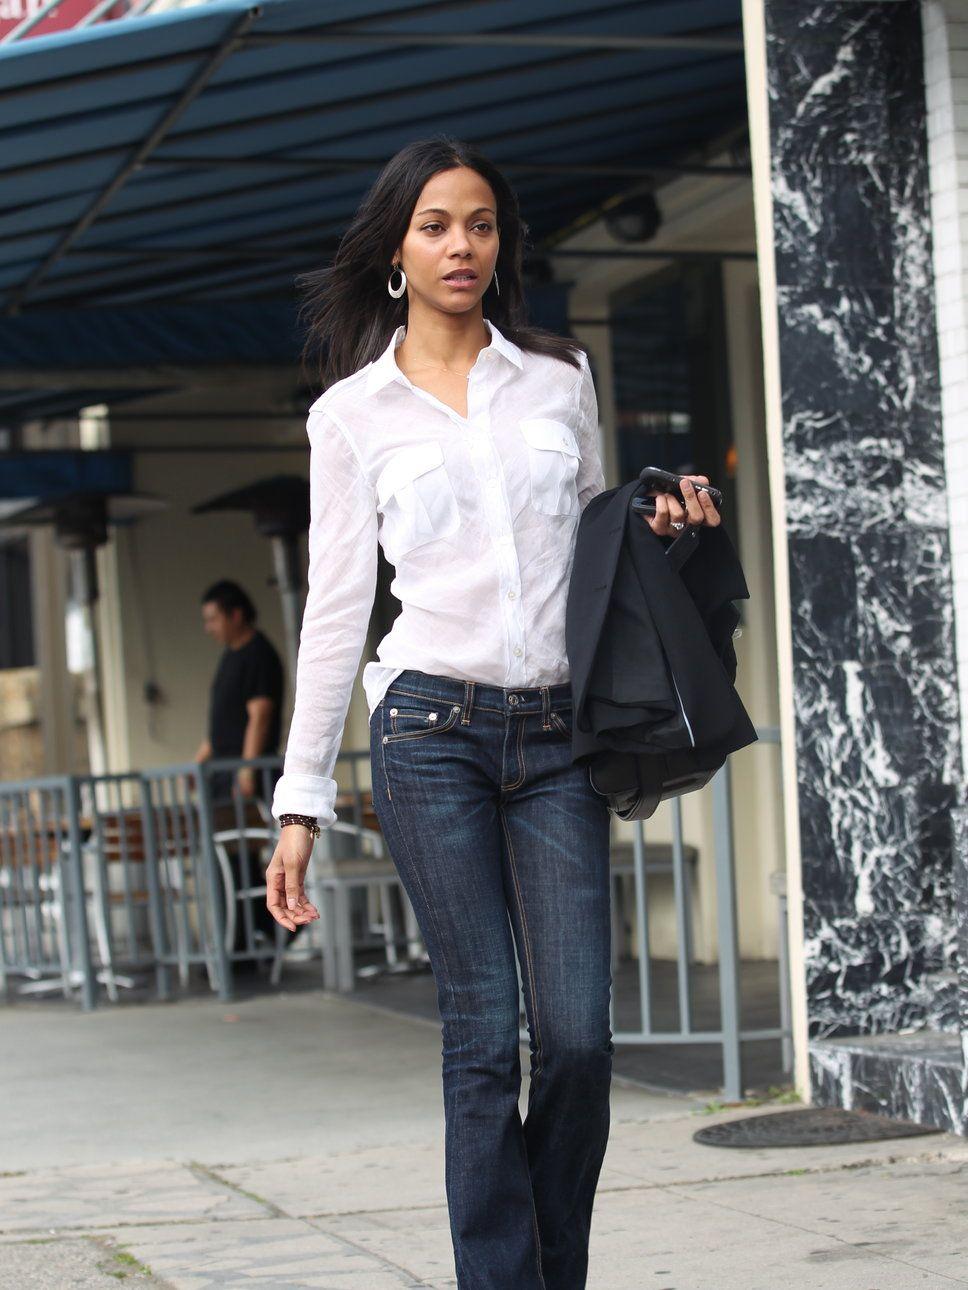 Zoe Saldana white shirt flared jeans jacket handbag | Back to ...